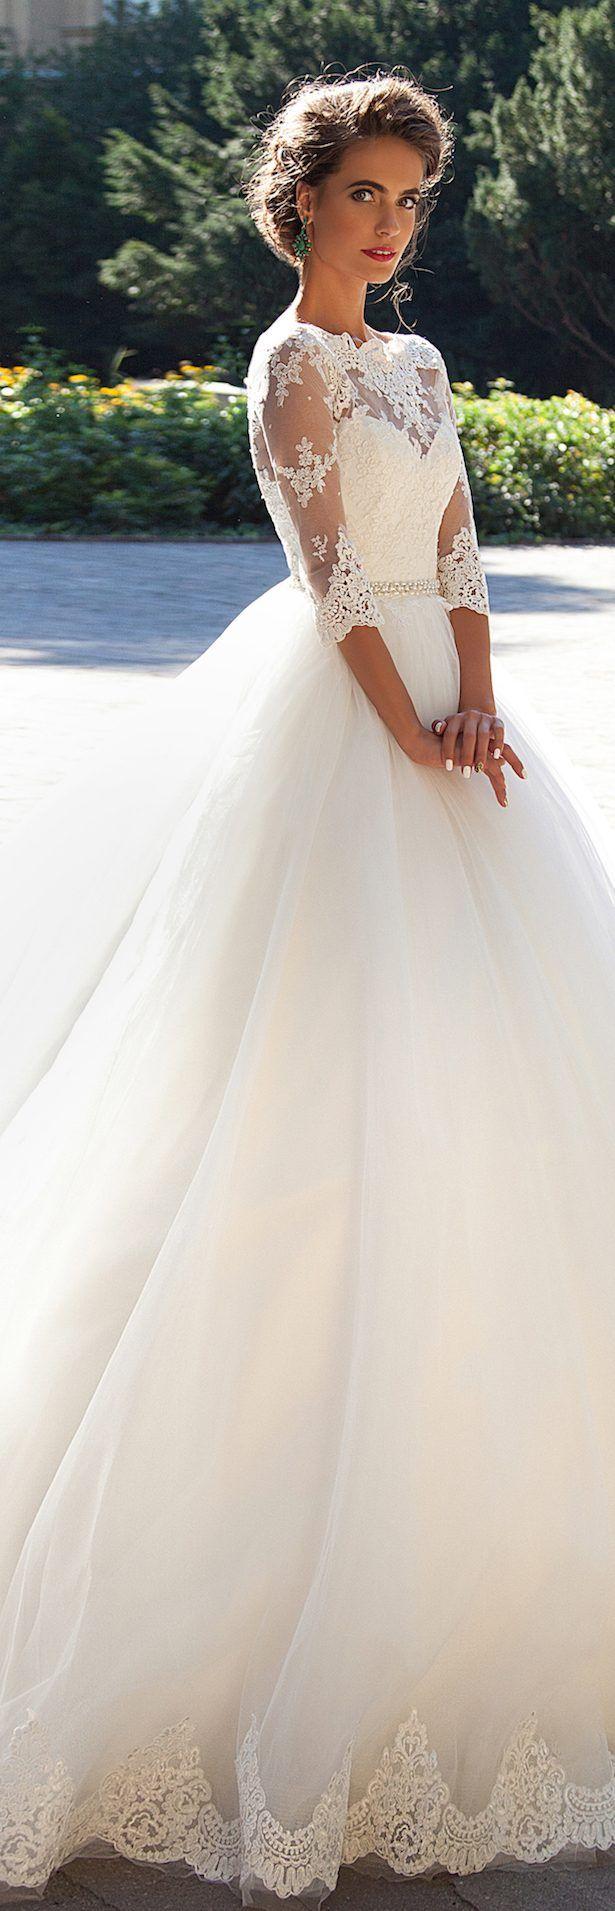 Milla Nova 2016 Bridal Collection - Krista - Belle The Magazine